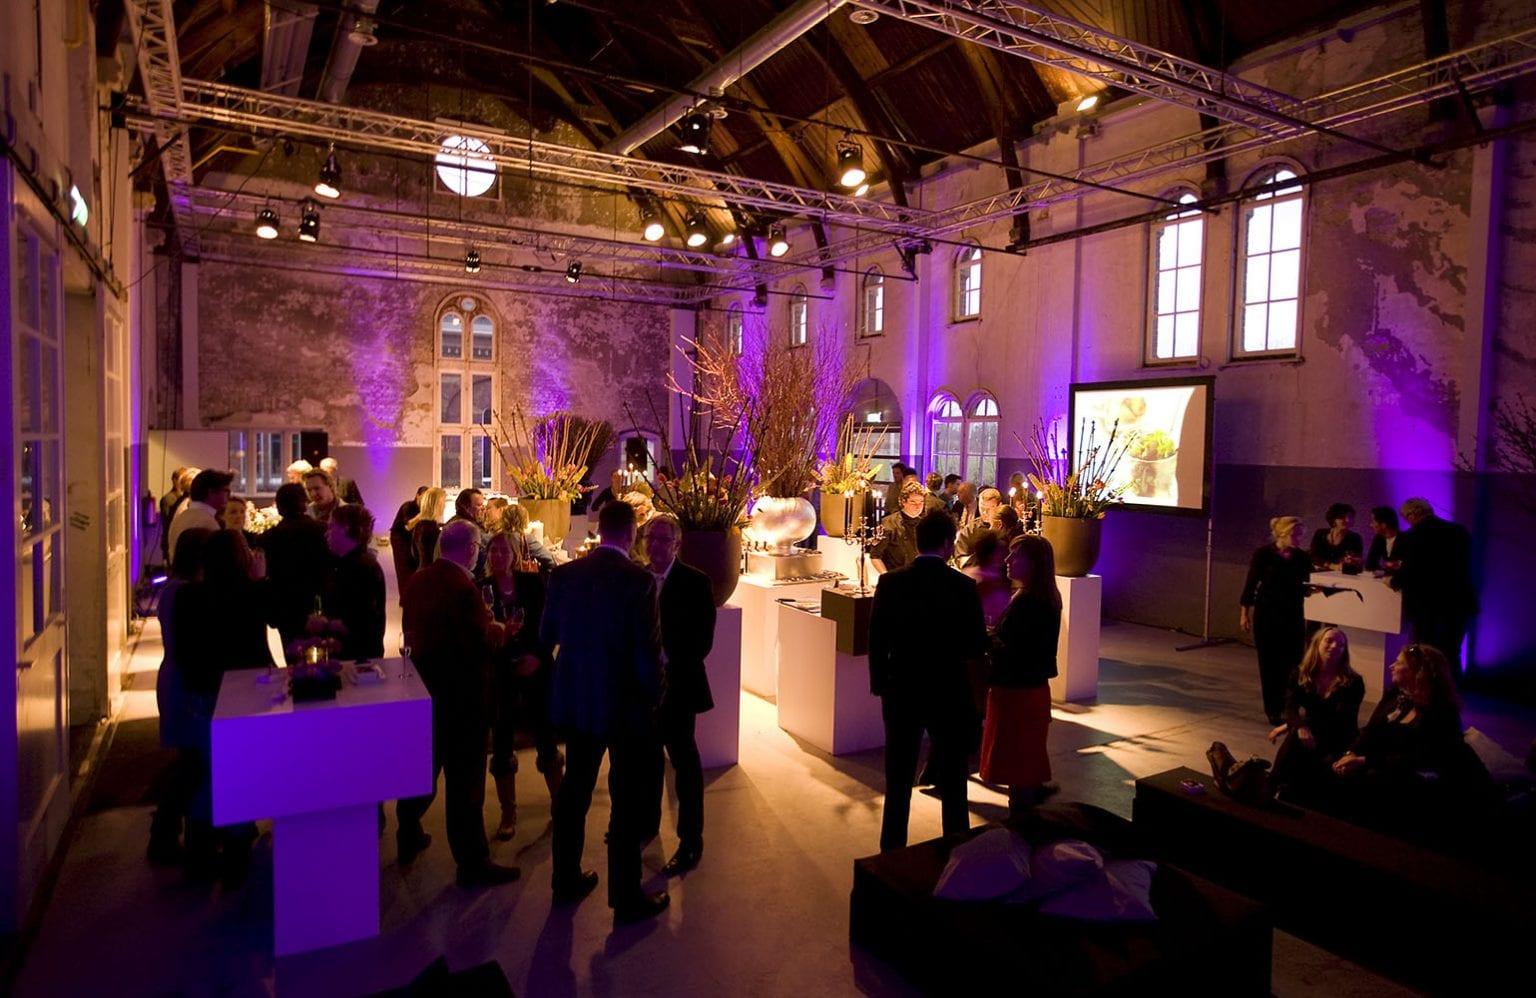 Westergasfabriek - Machinegebouw, reception